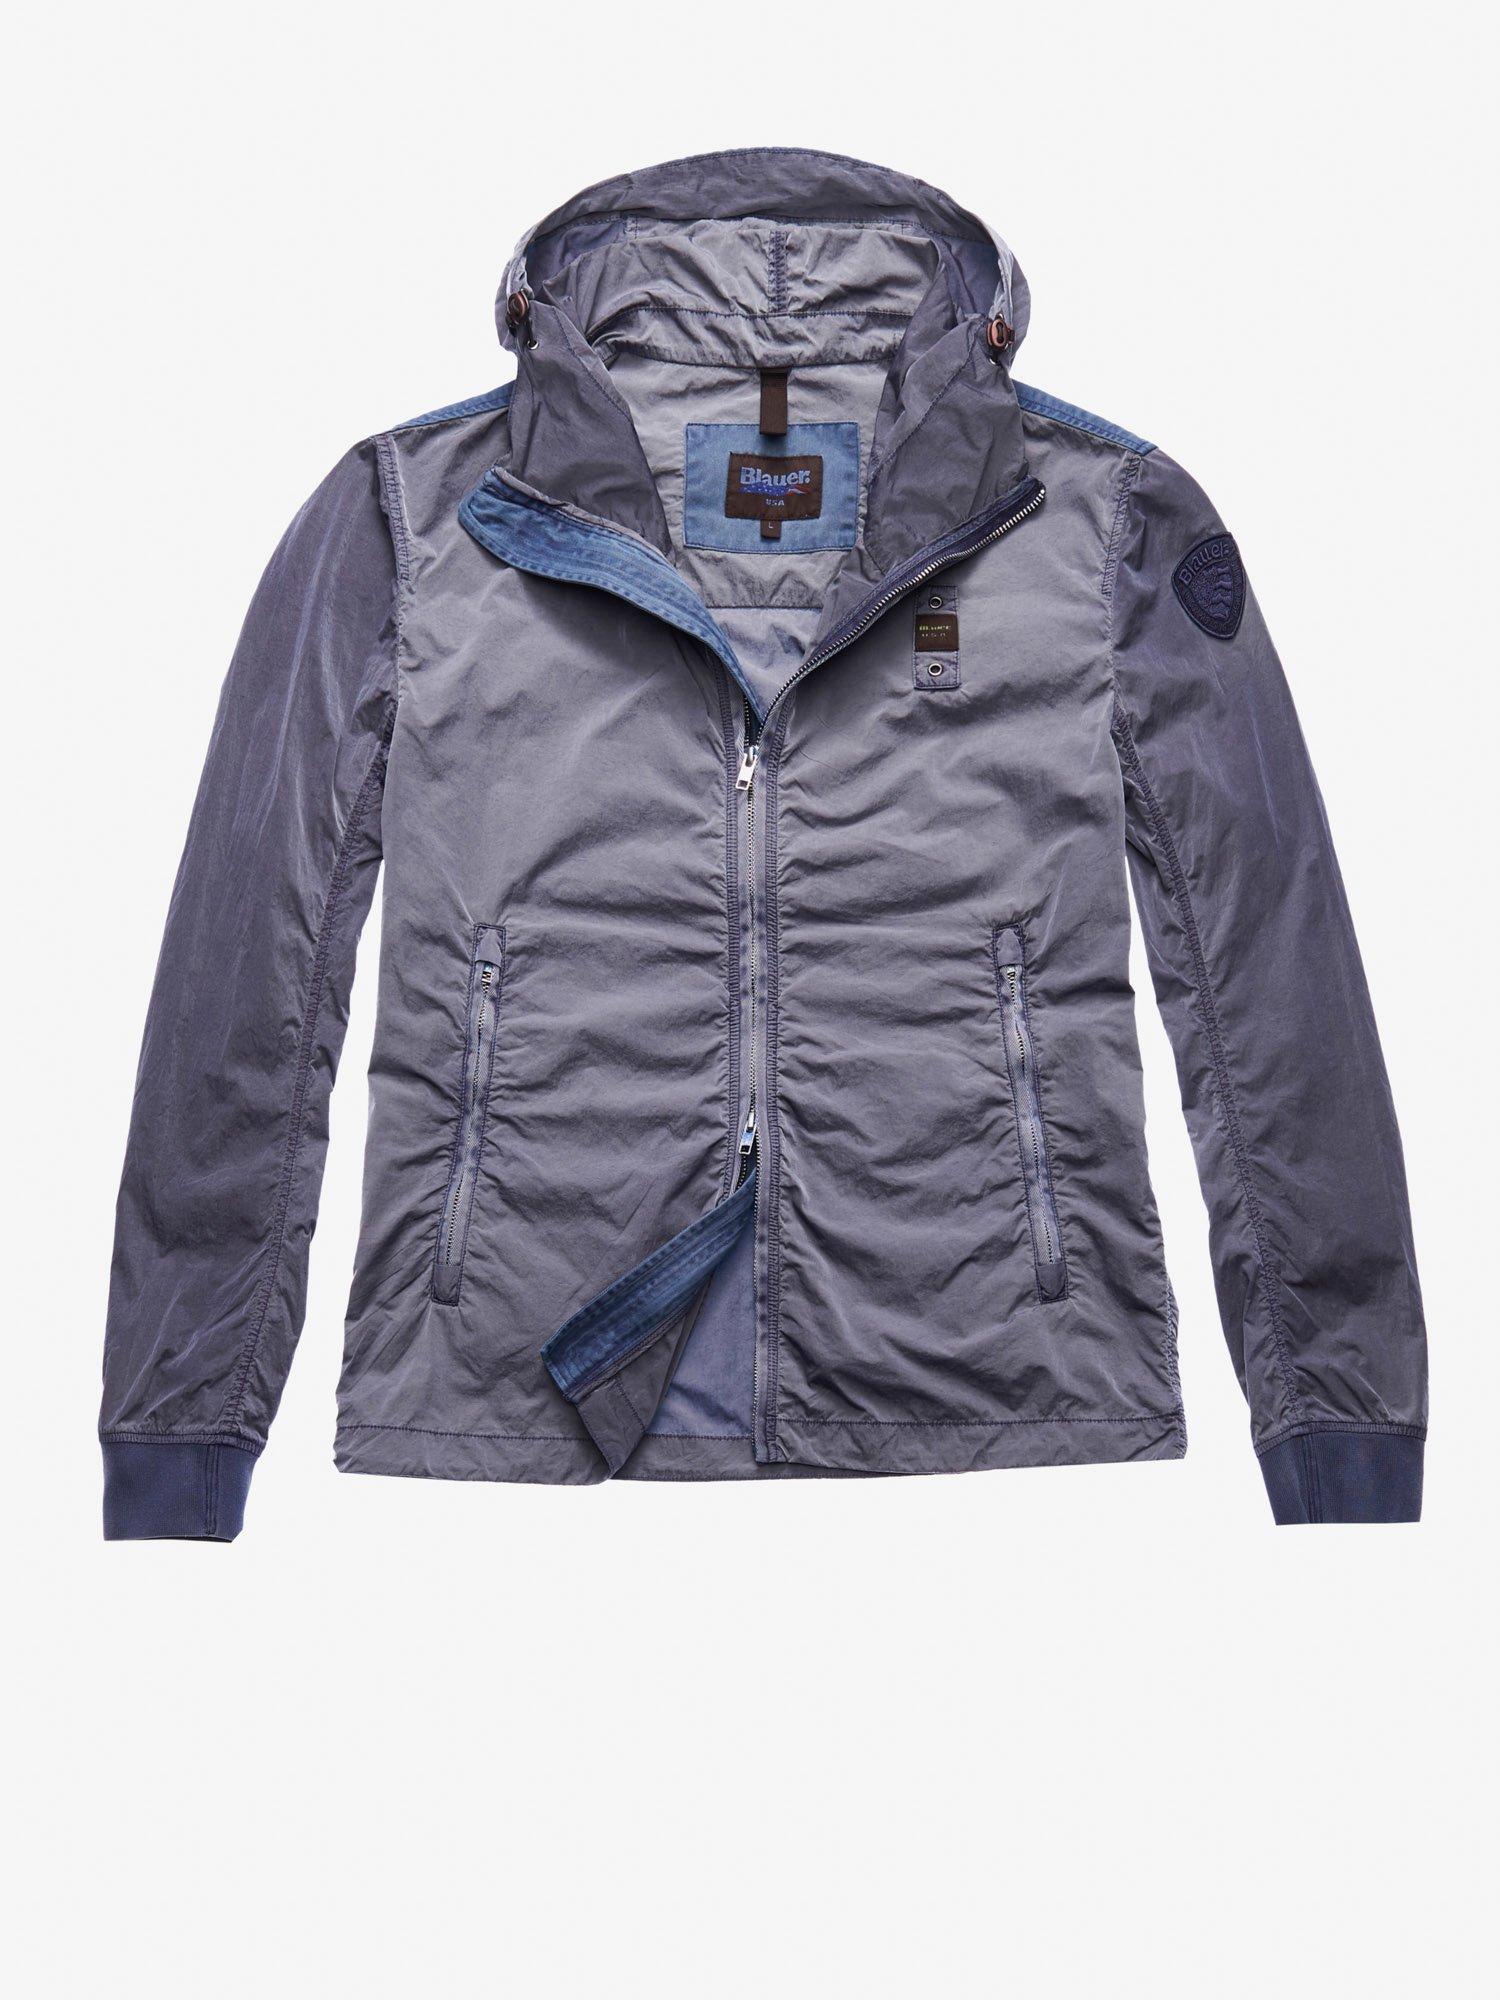 Blauer daytona jacket